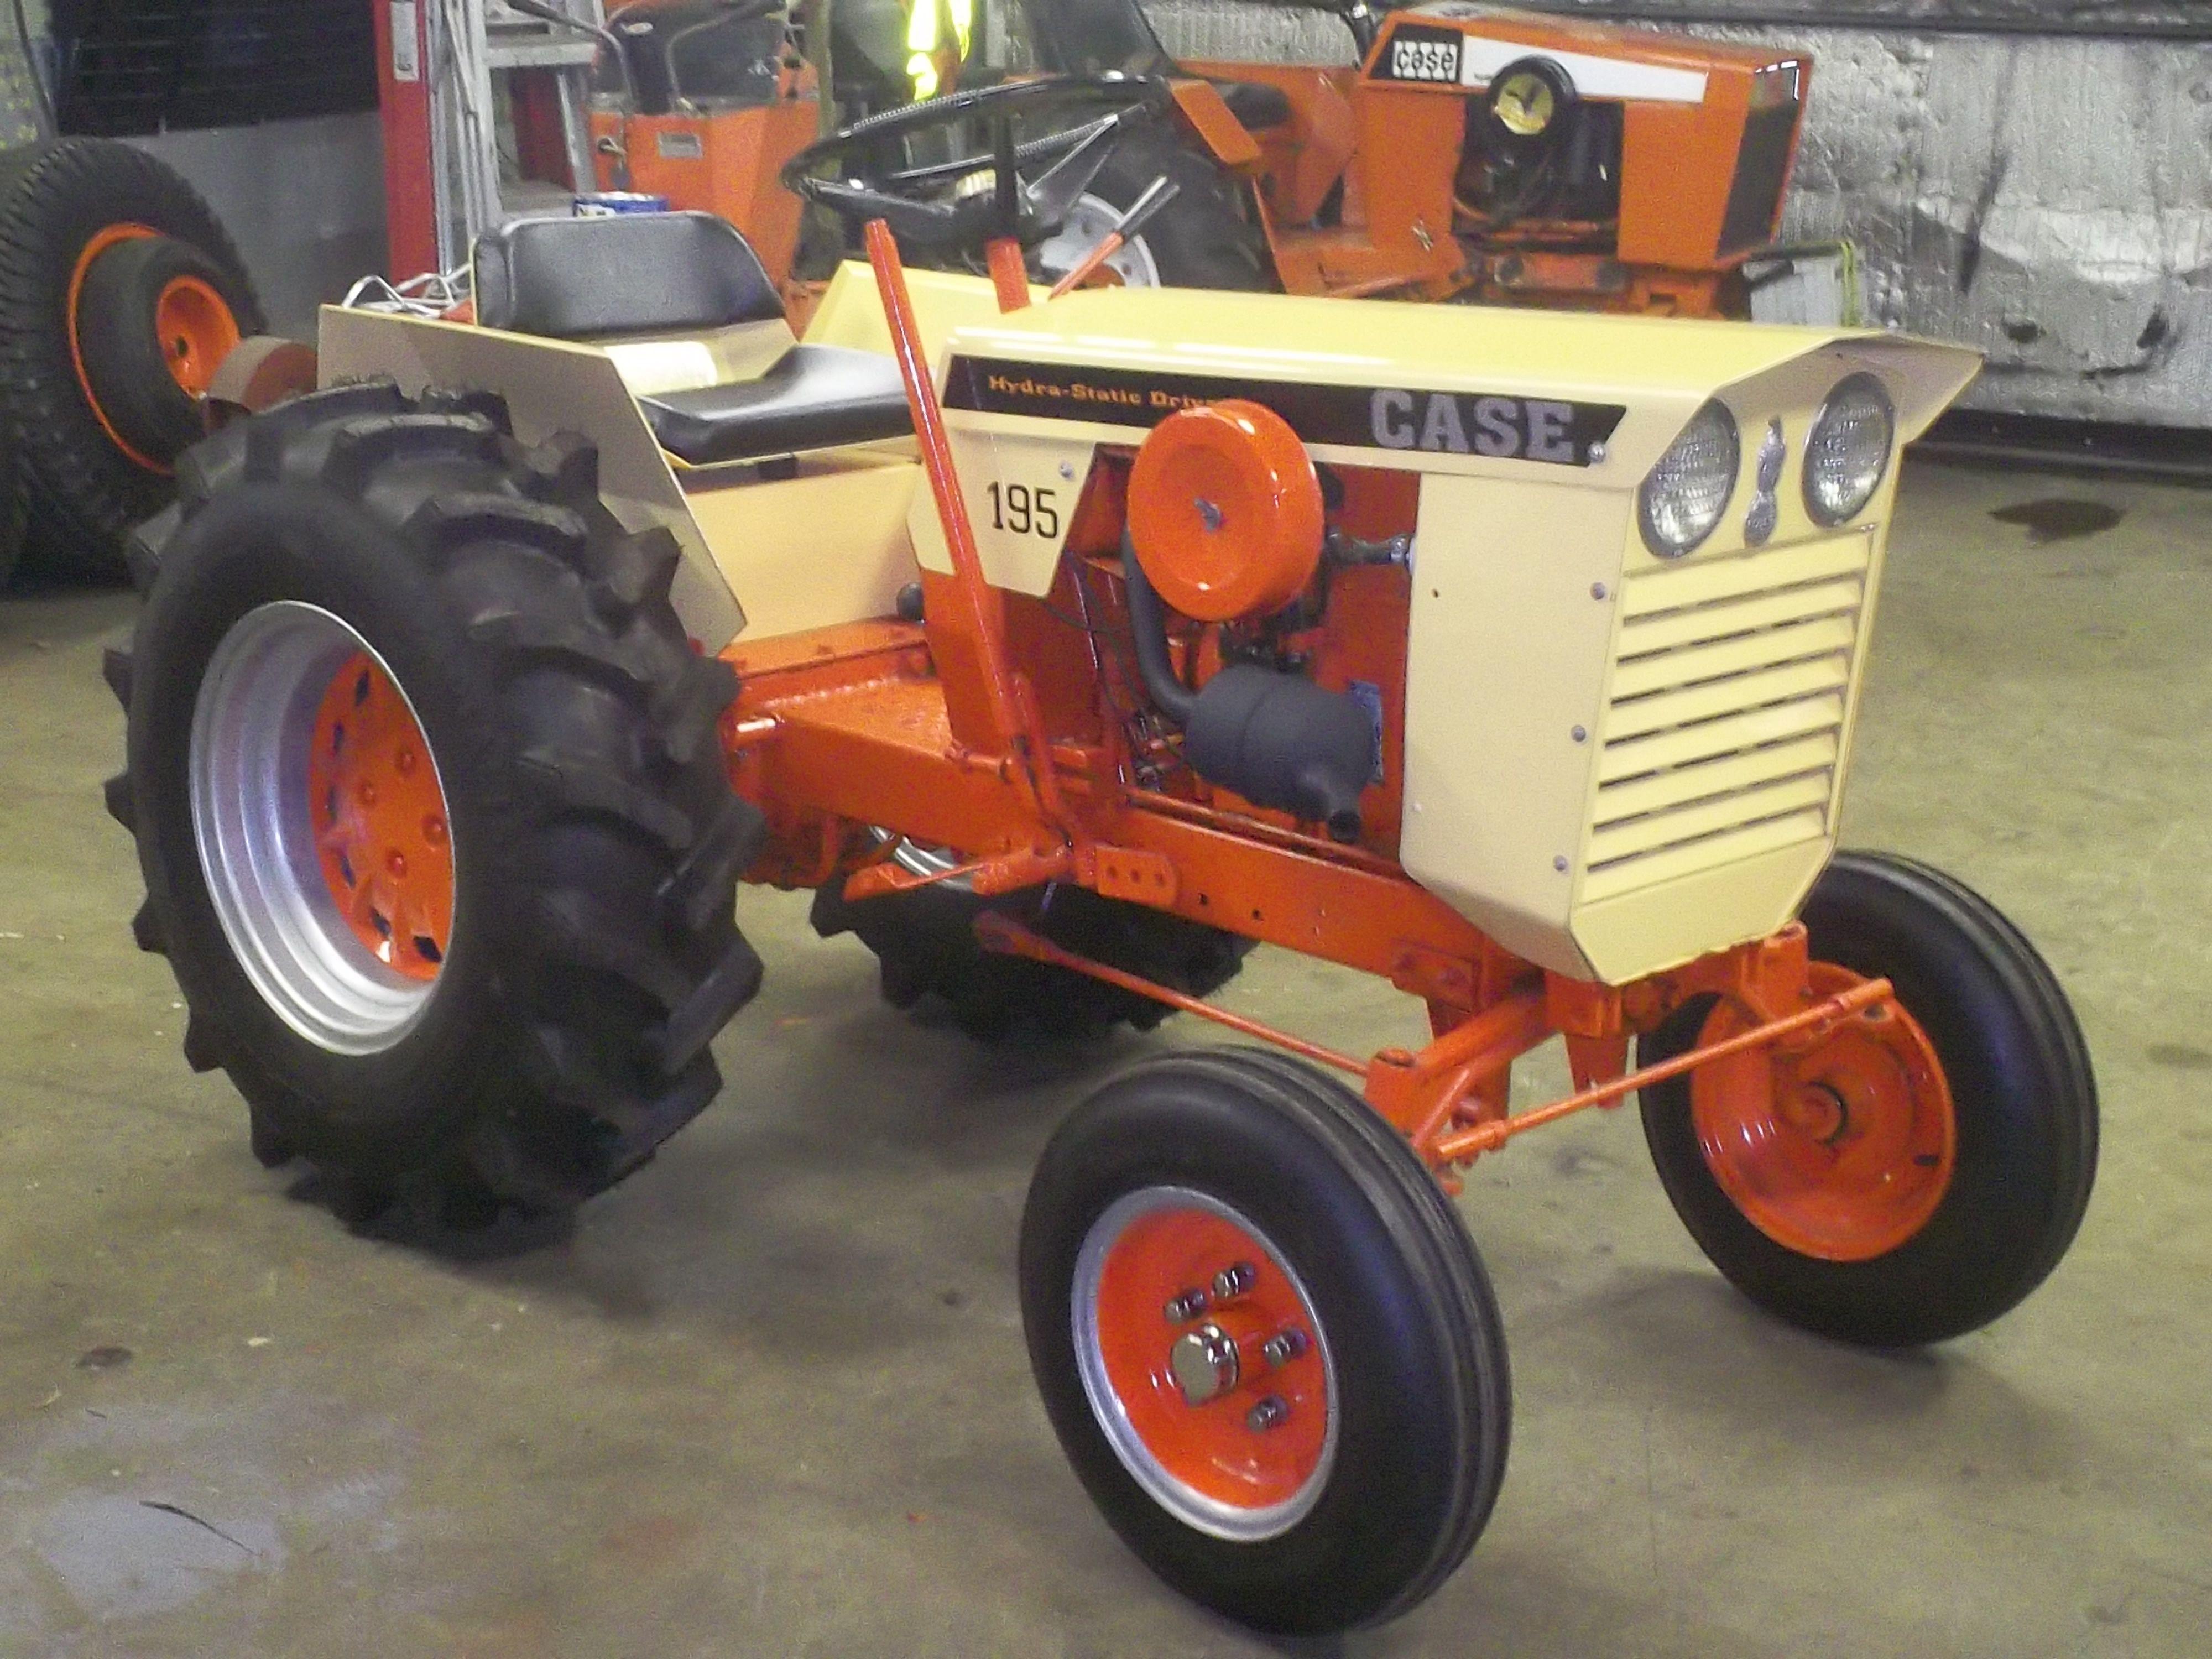 John Deere Planter Wiring Diagram Custom Restored Case 195 Hydra Static Drive Garden Tractor